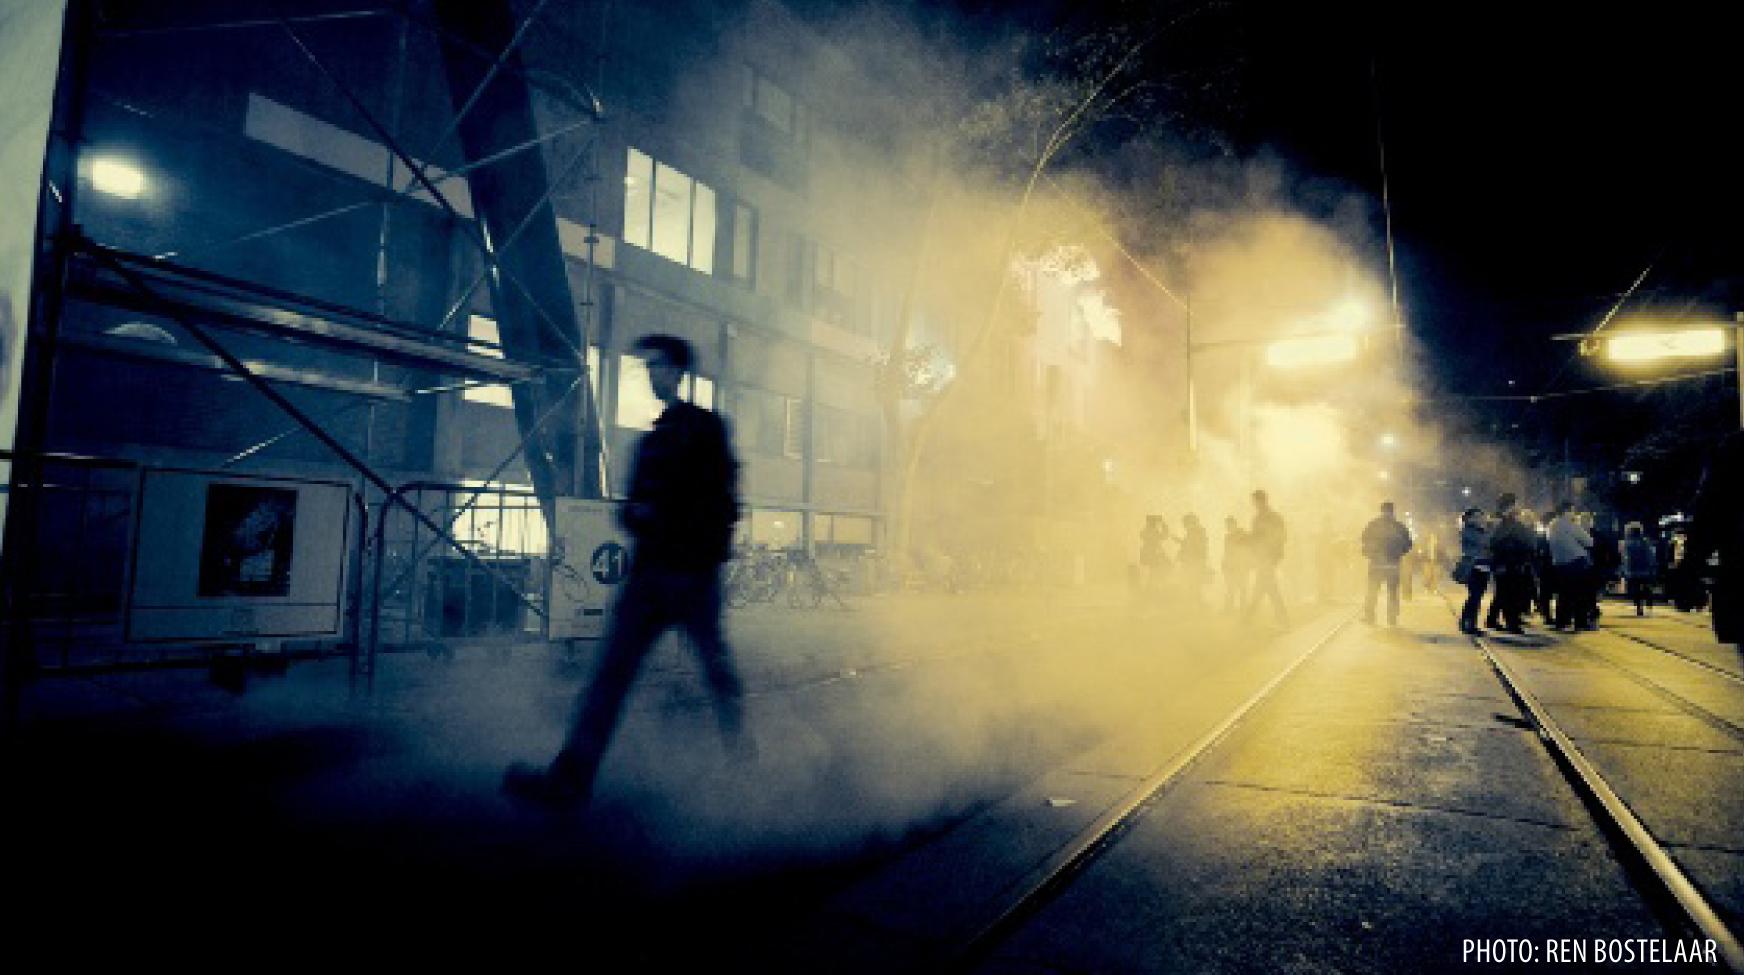 Low Light Shooting By Ren Bostelaar Pictures Gallery